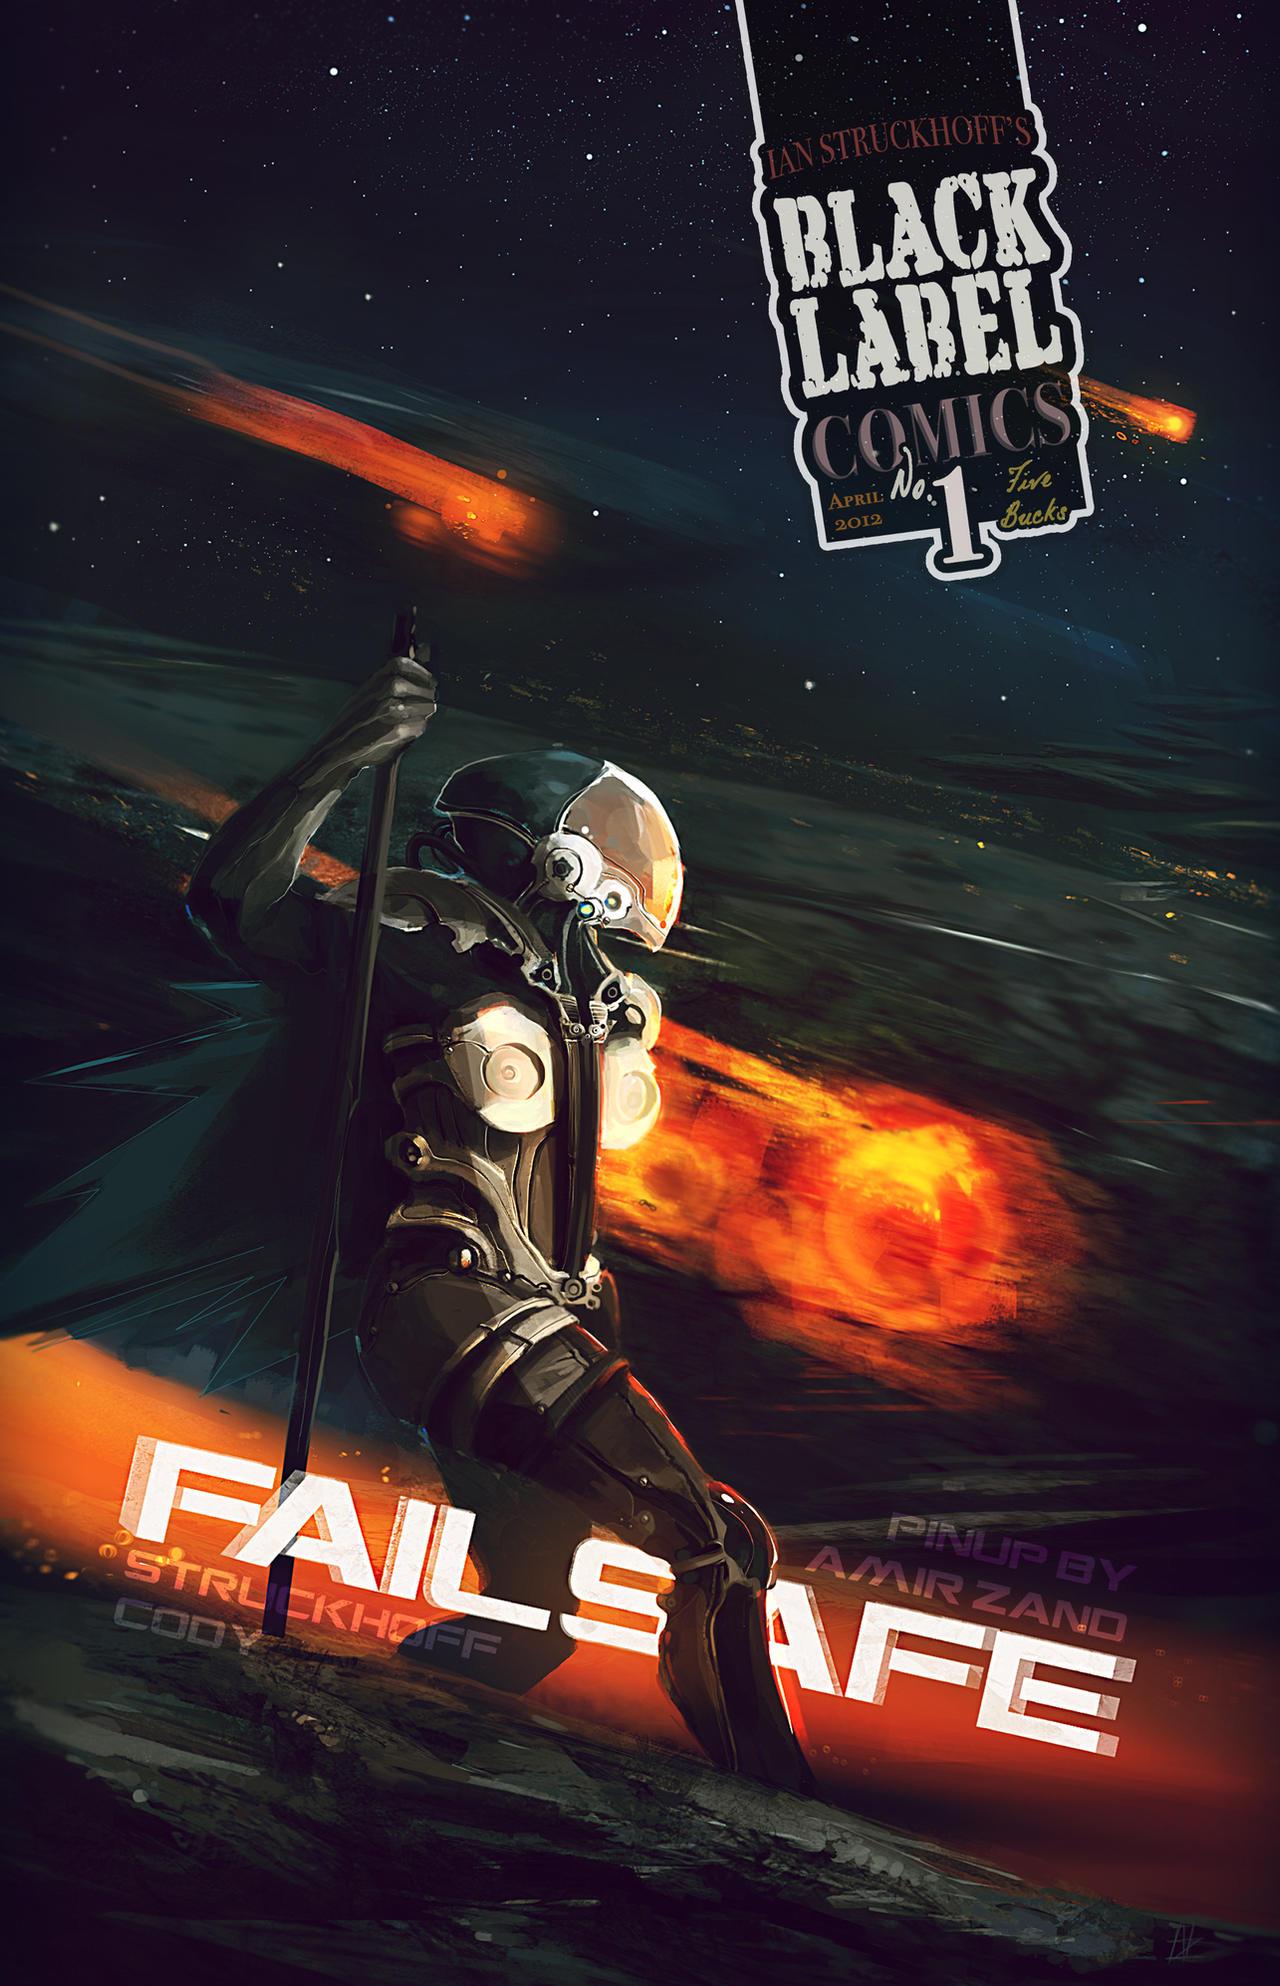 FAILSAFE pin-up by Amir Zand